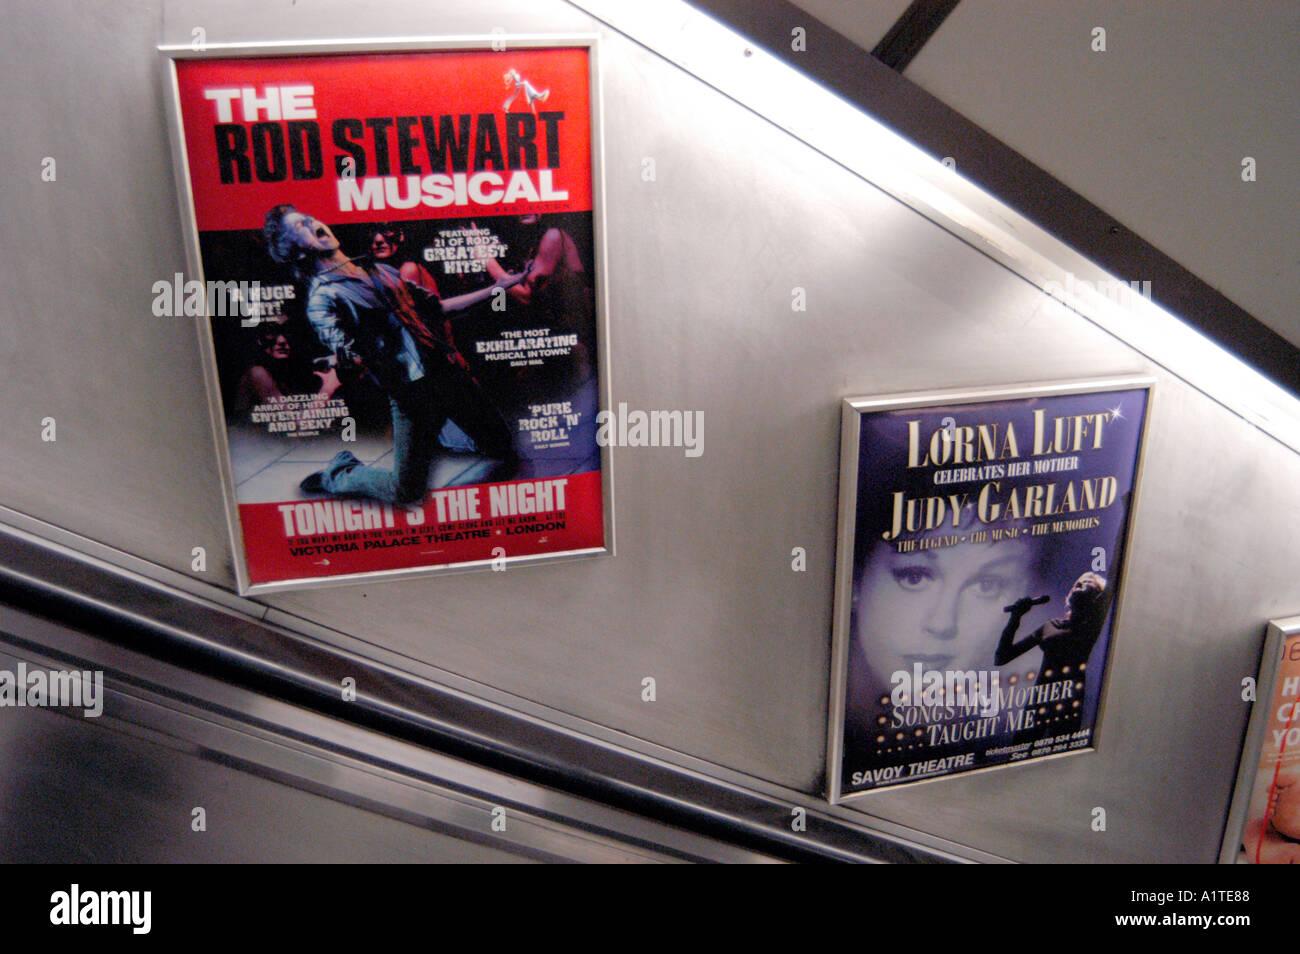 Adverts on the London underground - Stock Image